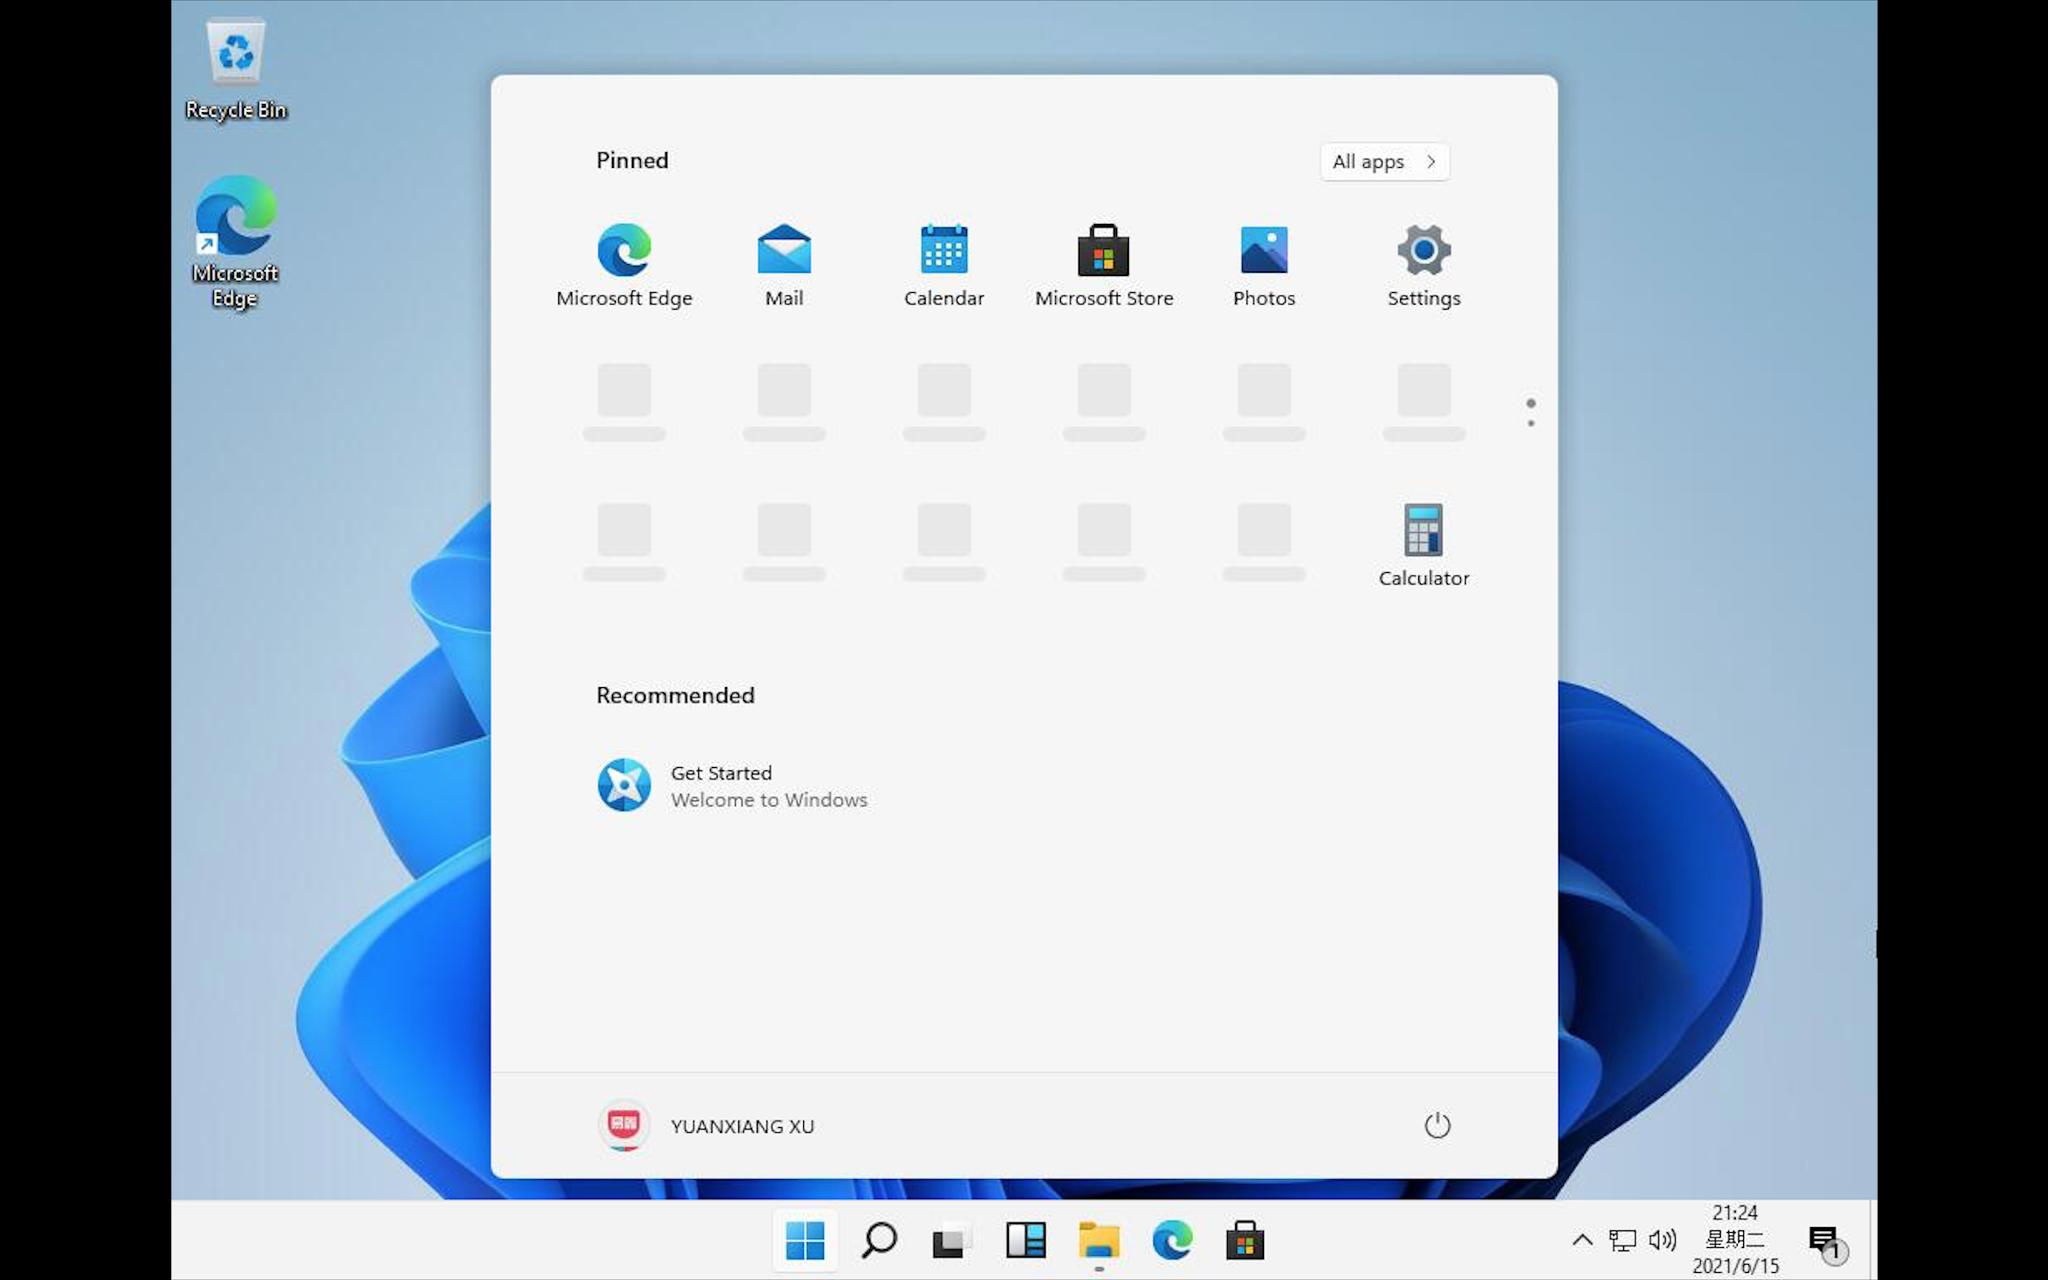 Leak Shows Off 'Windows 11' Ahead of Next Week's Microsoft Event